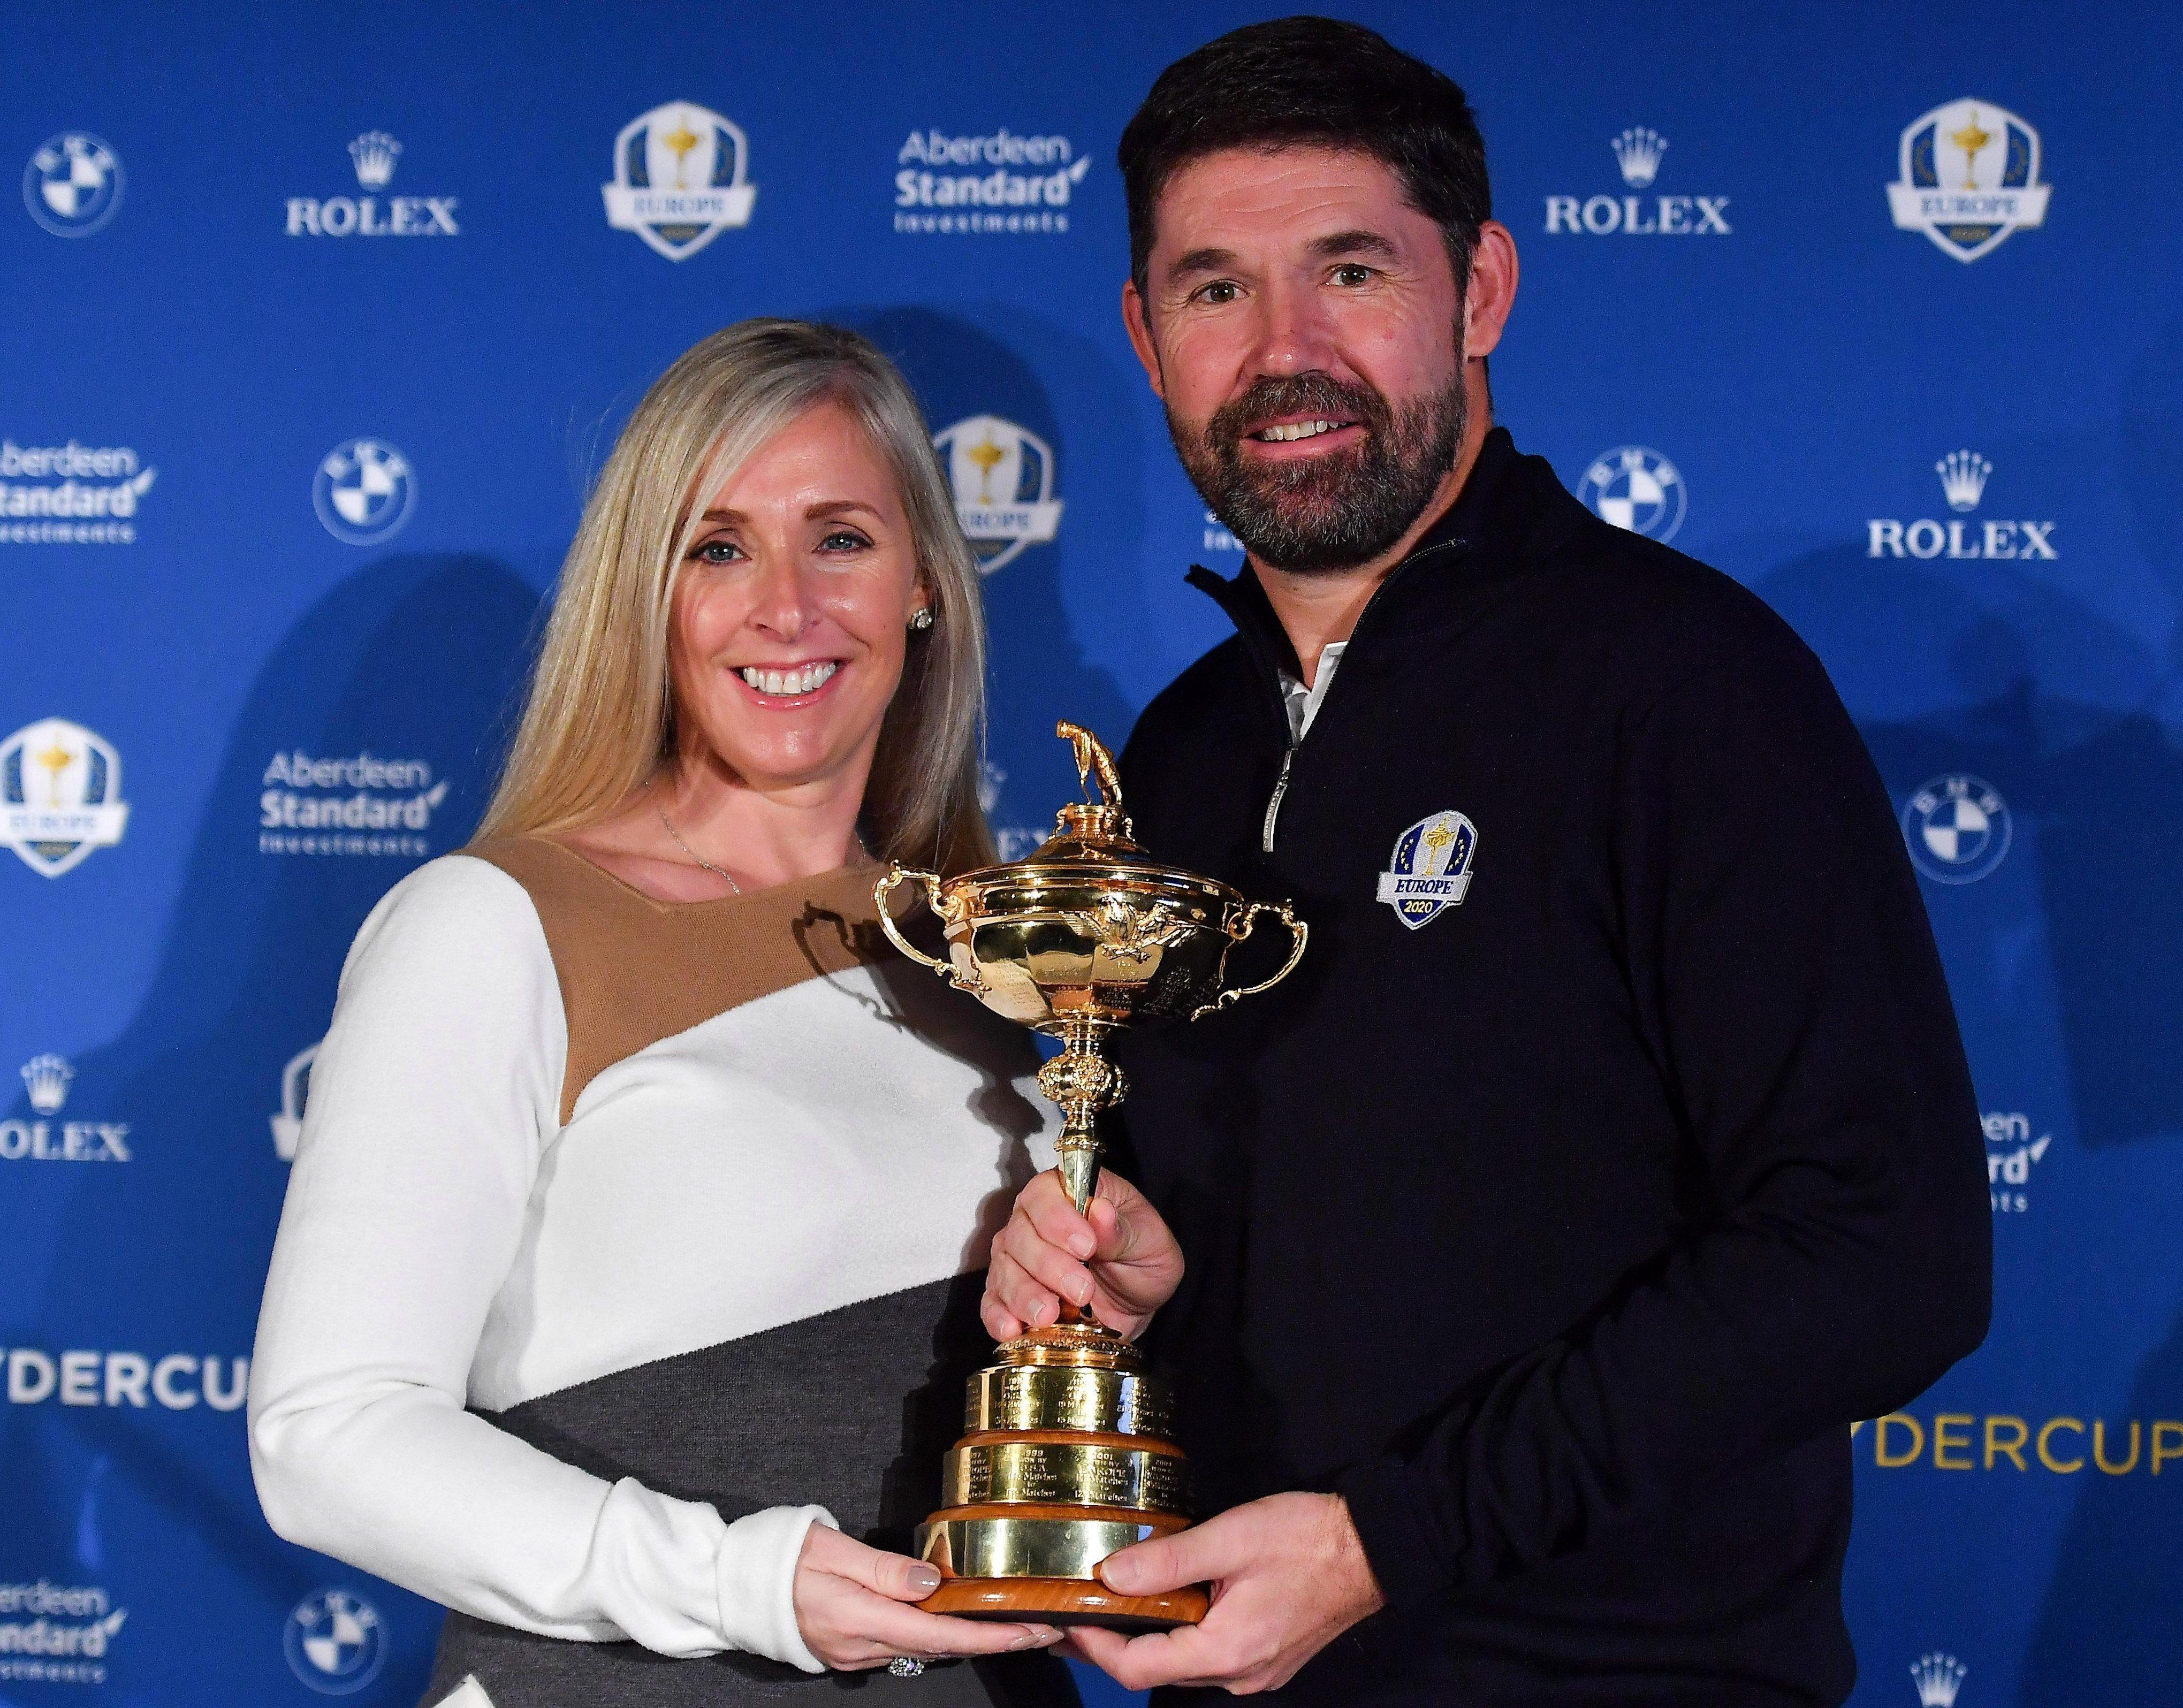 Padraig Harrington and his wife Caroline with the trophy